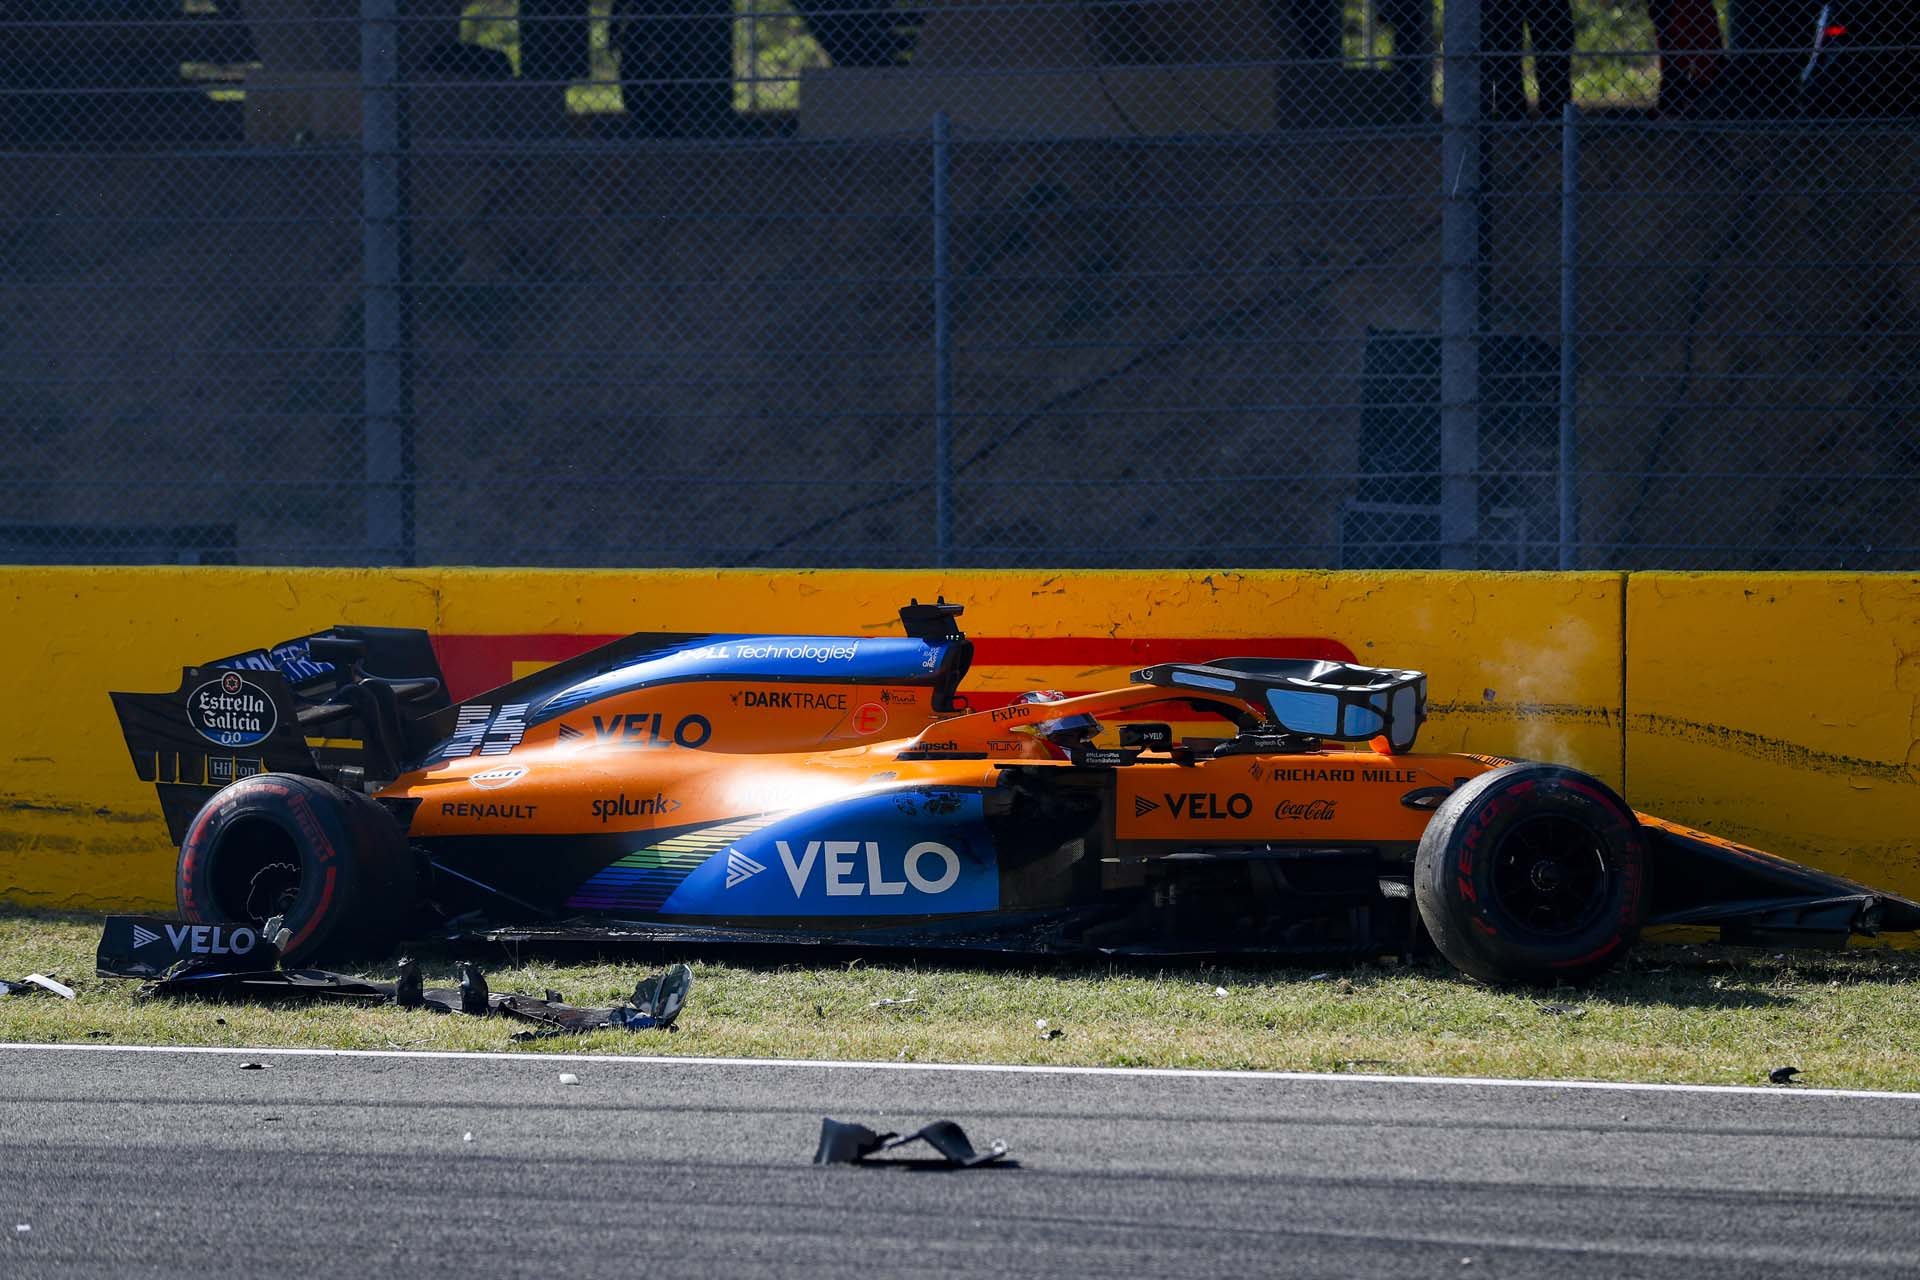 Carlos Sainz, McLaren MCL35, crashes out